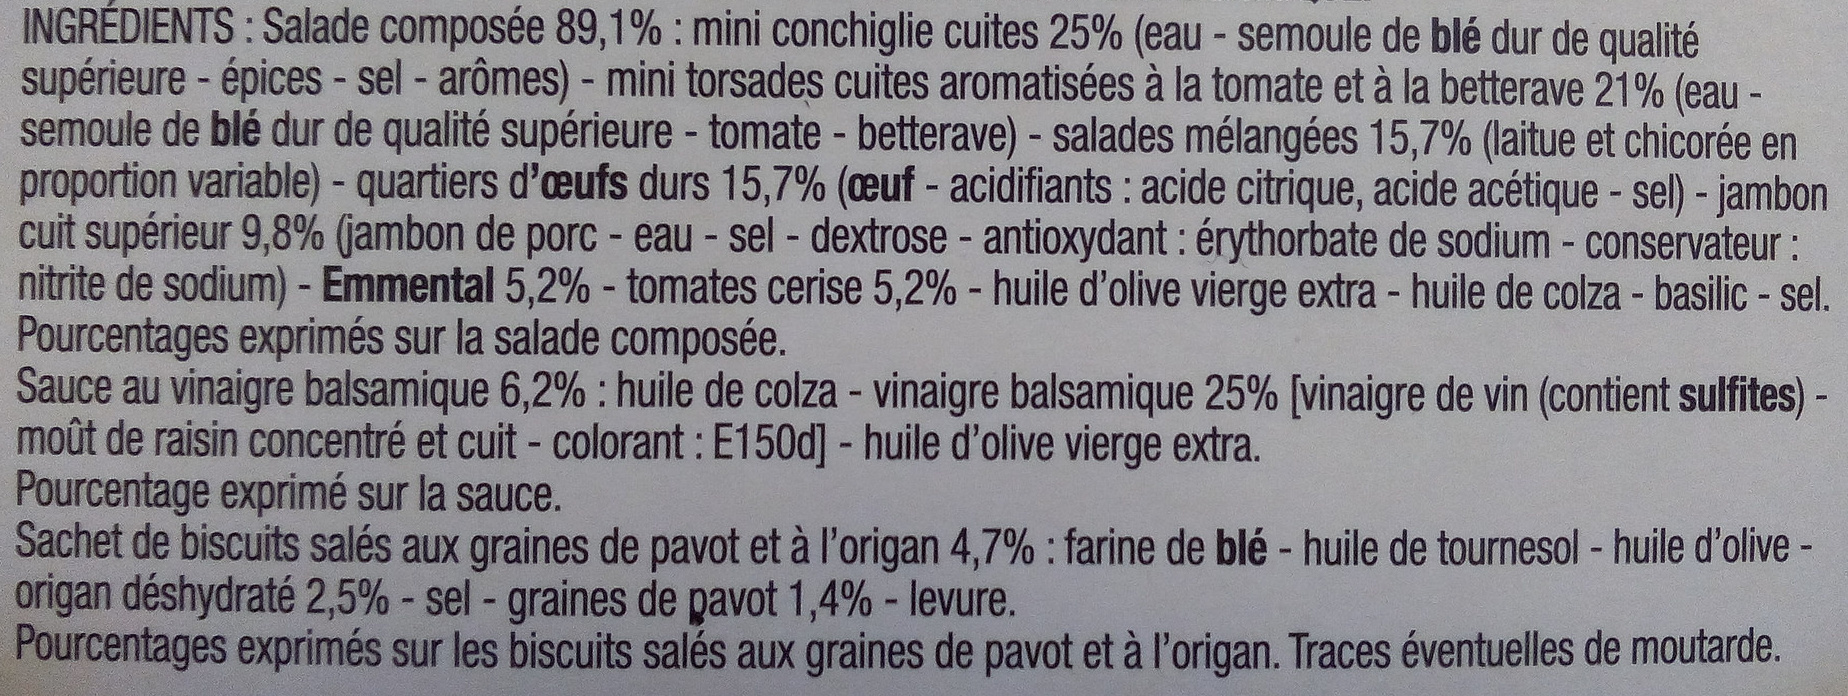 Salade de pâtes, Jambon, œuf, emmental - Ingredients - fr